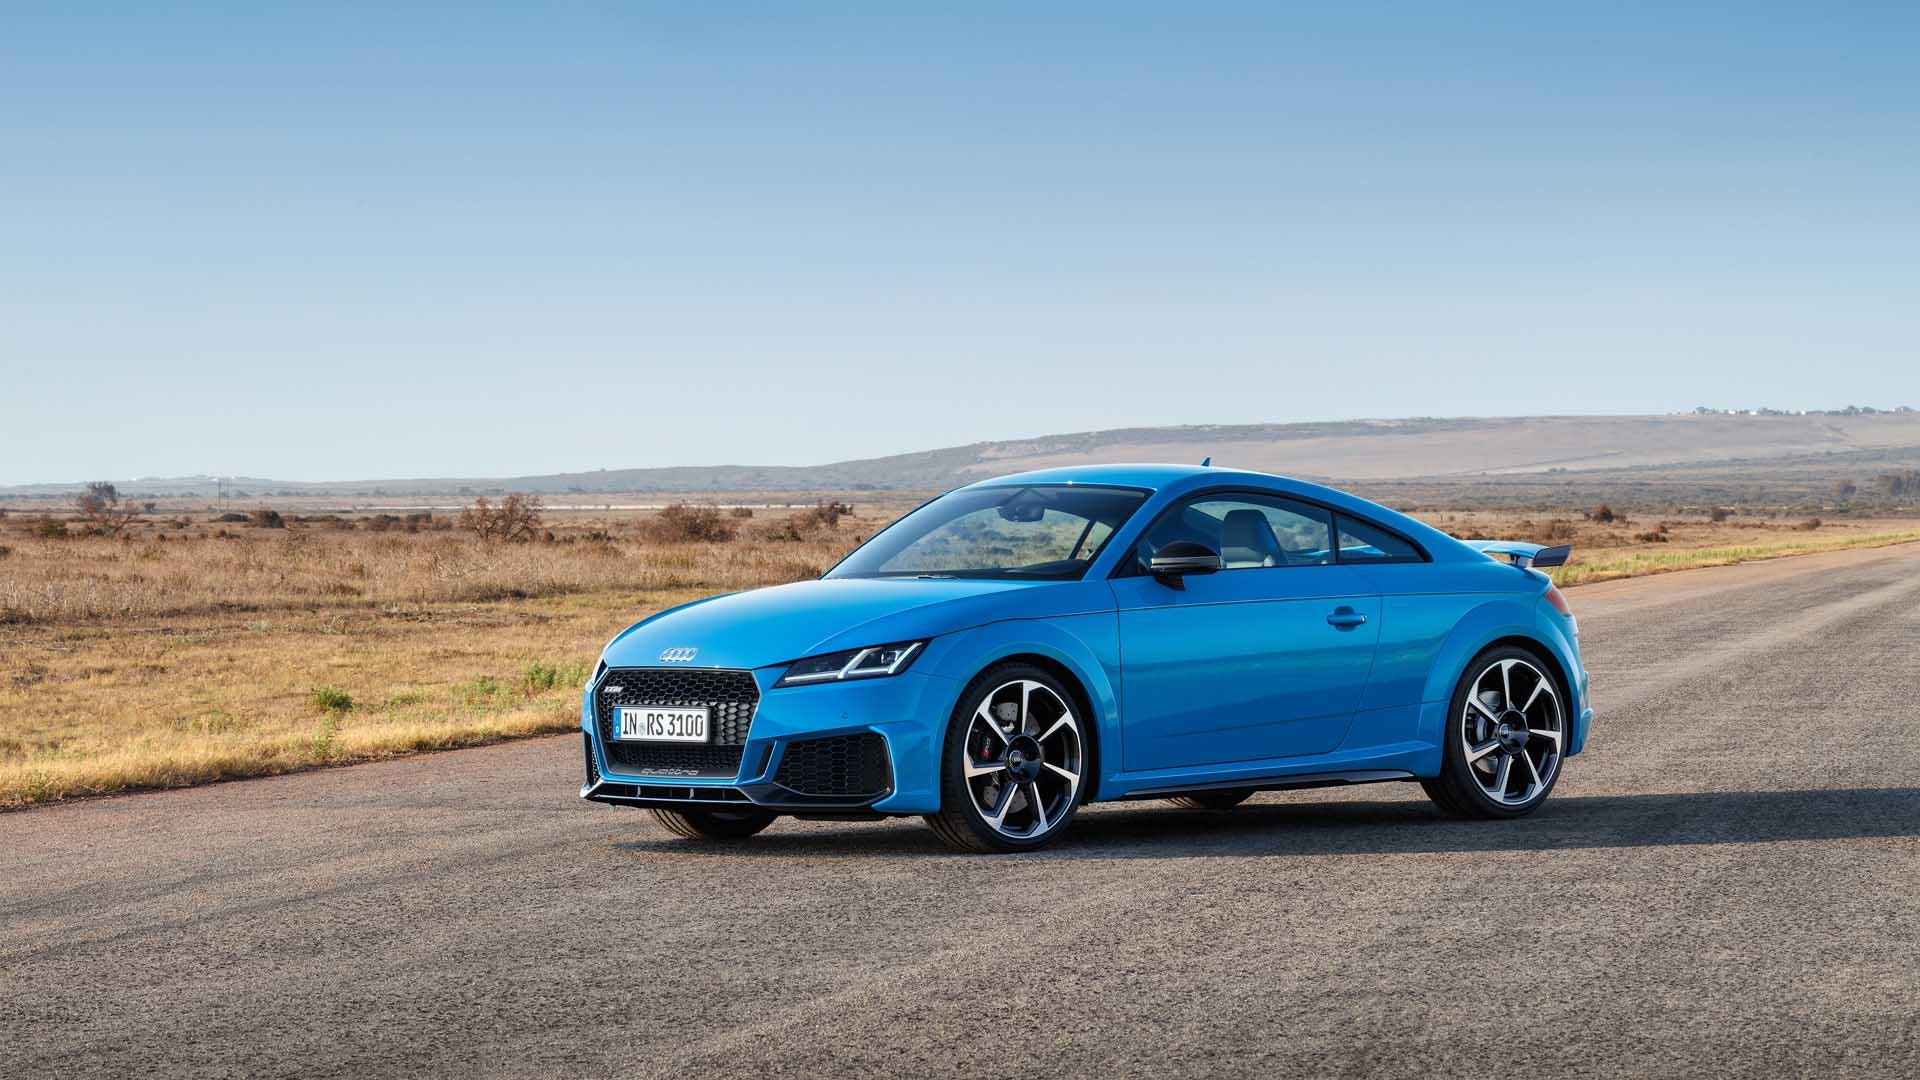 2021 Audi TT Speed Test